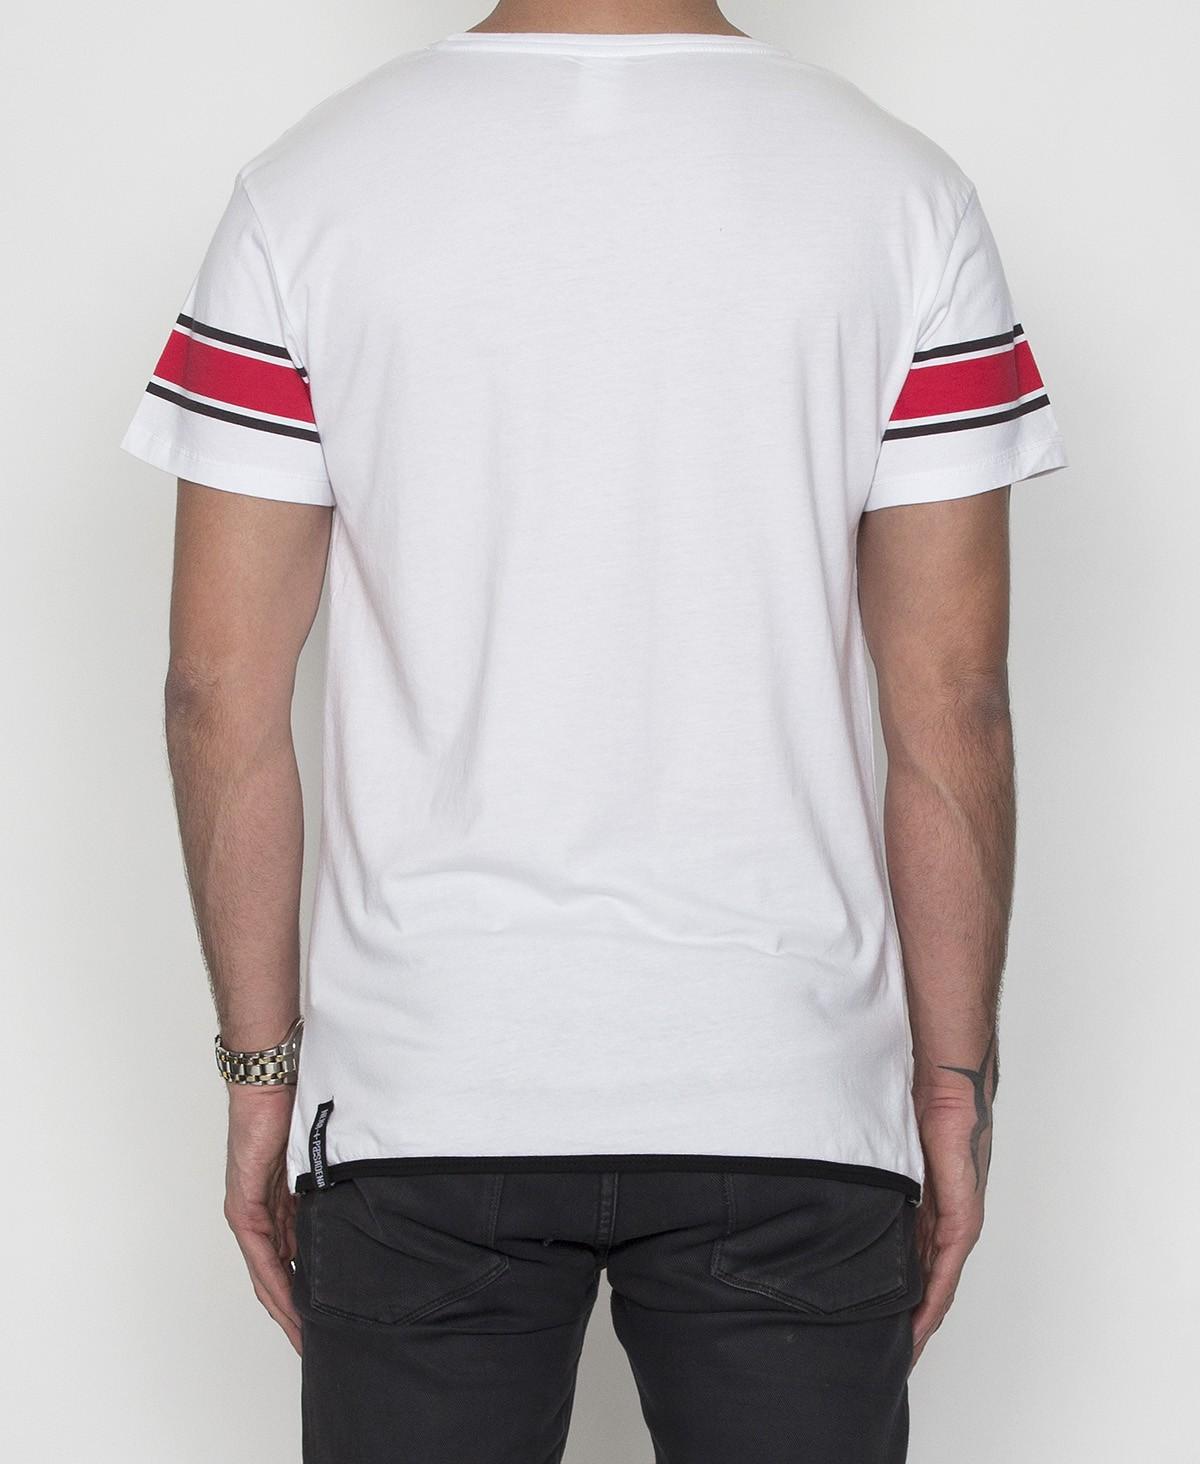 3-Peat T-Shirt Optical White